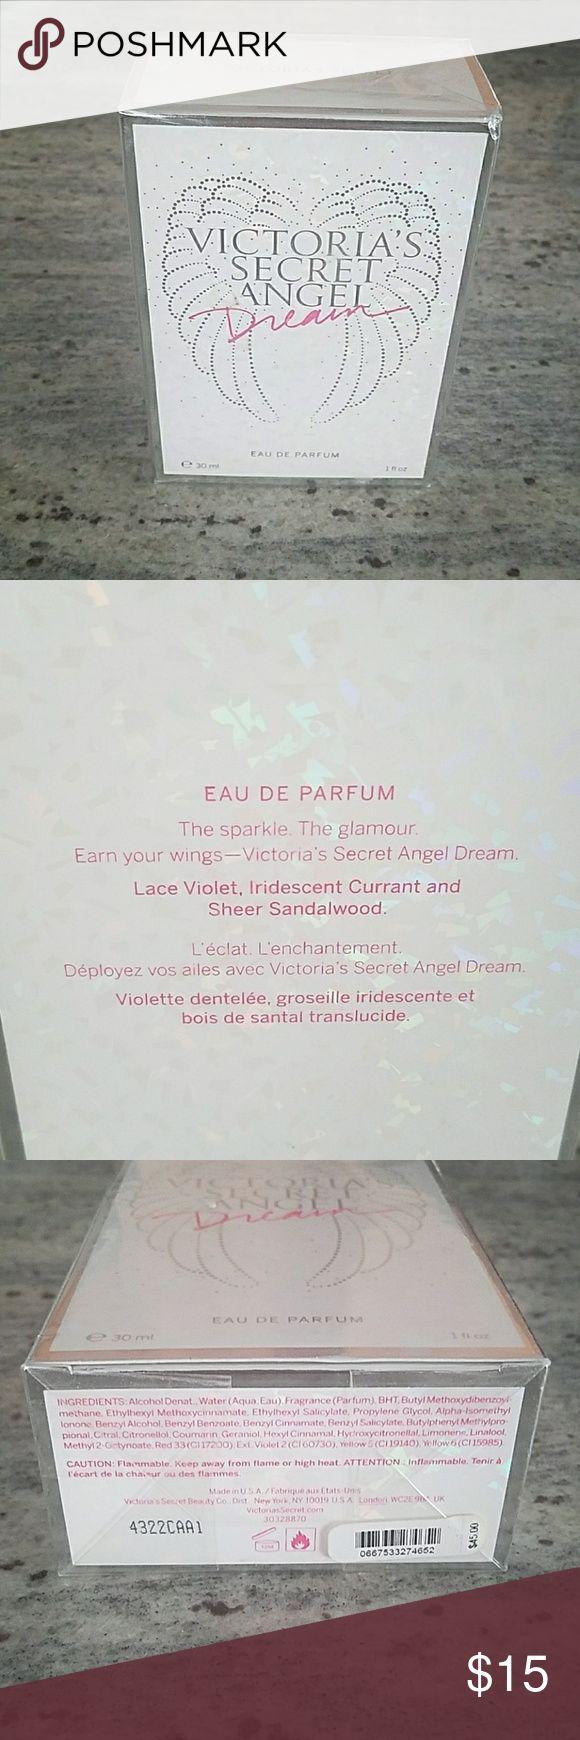 Victoria's Secret Angel Dream perfume 1 fl oz (30ml) of Eau De Parfum - Victoria's Secret Angel Dream. Comes in original box and is unopened (clear wrap still around box) Victoria's Secret Other